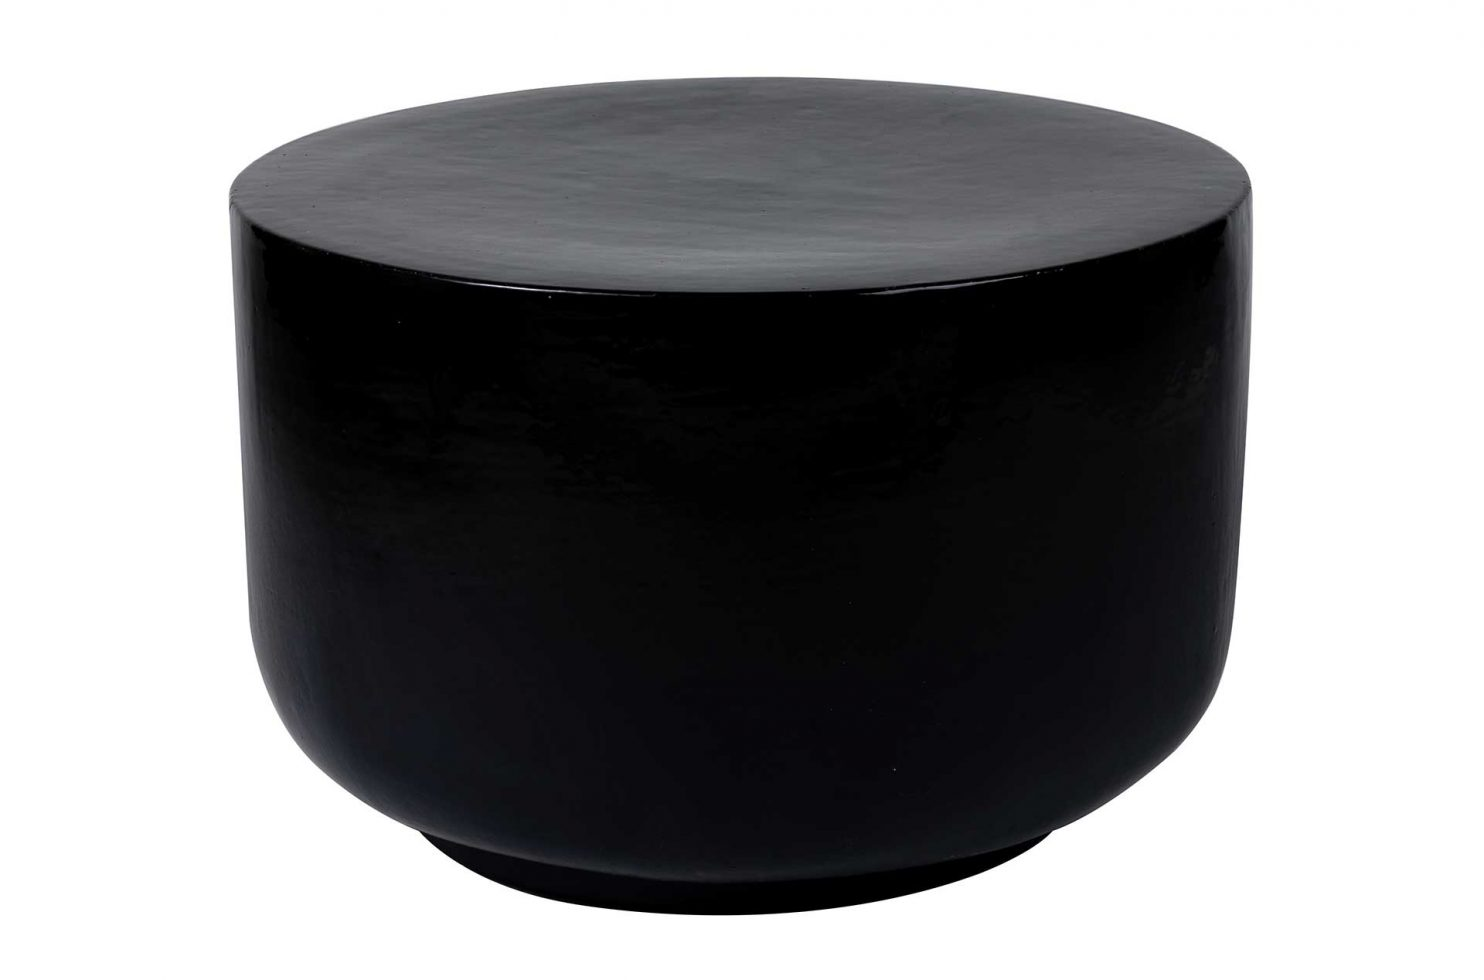 prov cer serenity side table 20in C3080152132 jet coal 1 main web